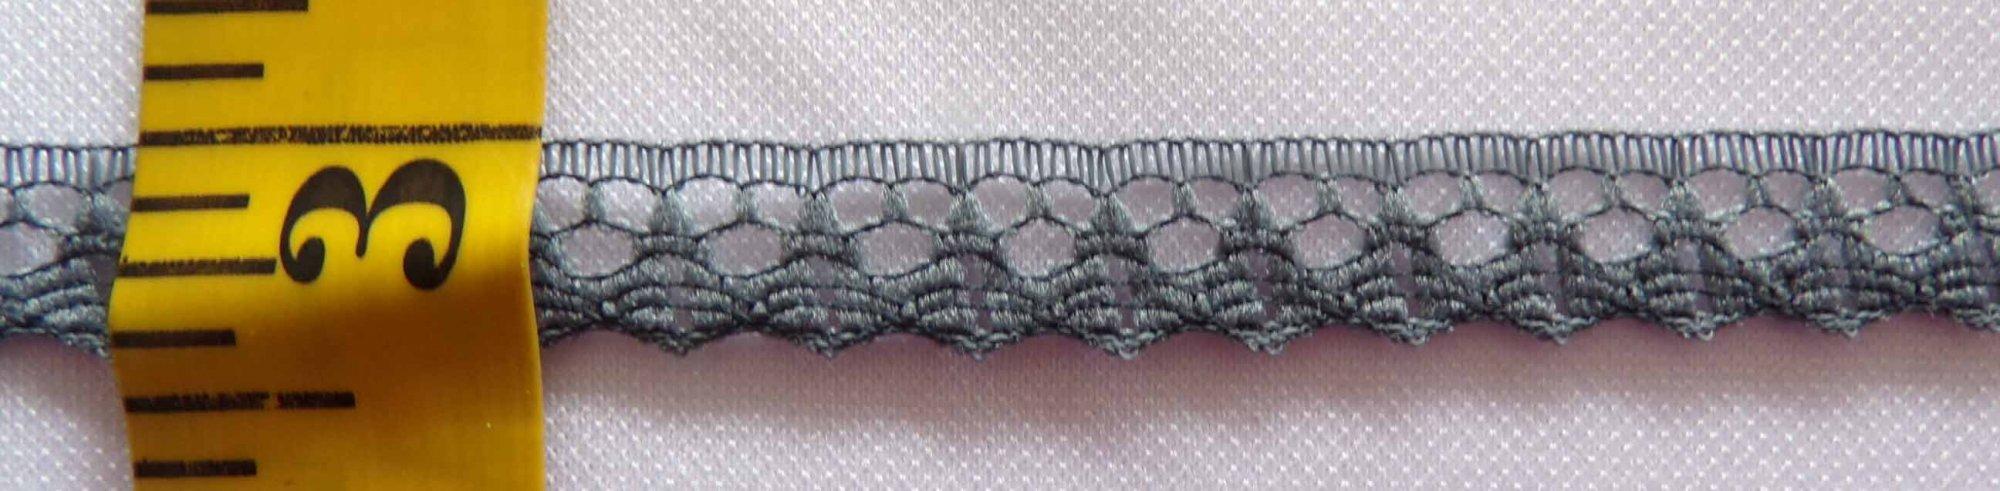 3/8 Rigid Lace - Dark Gray